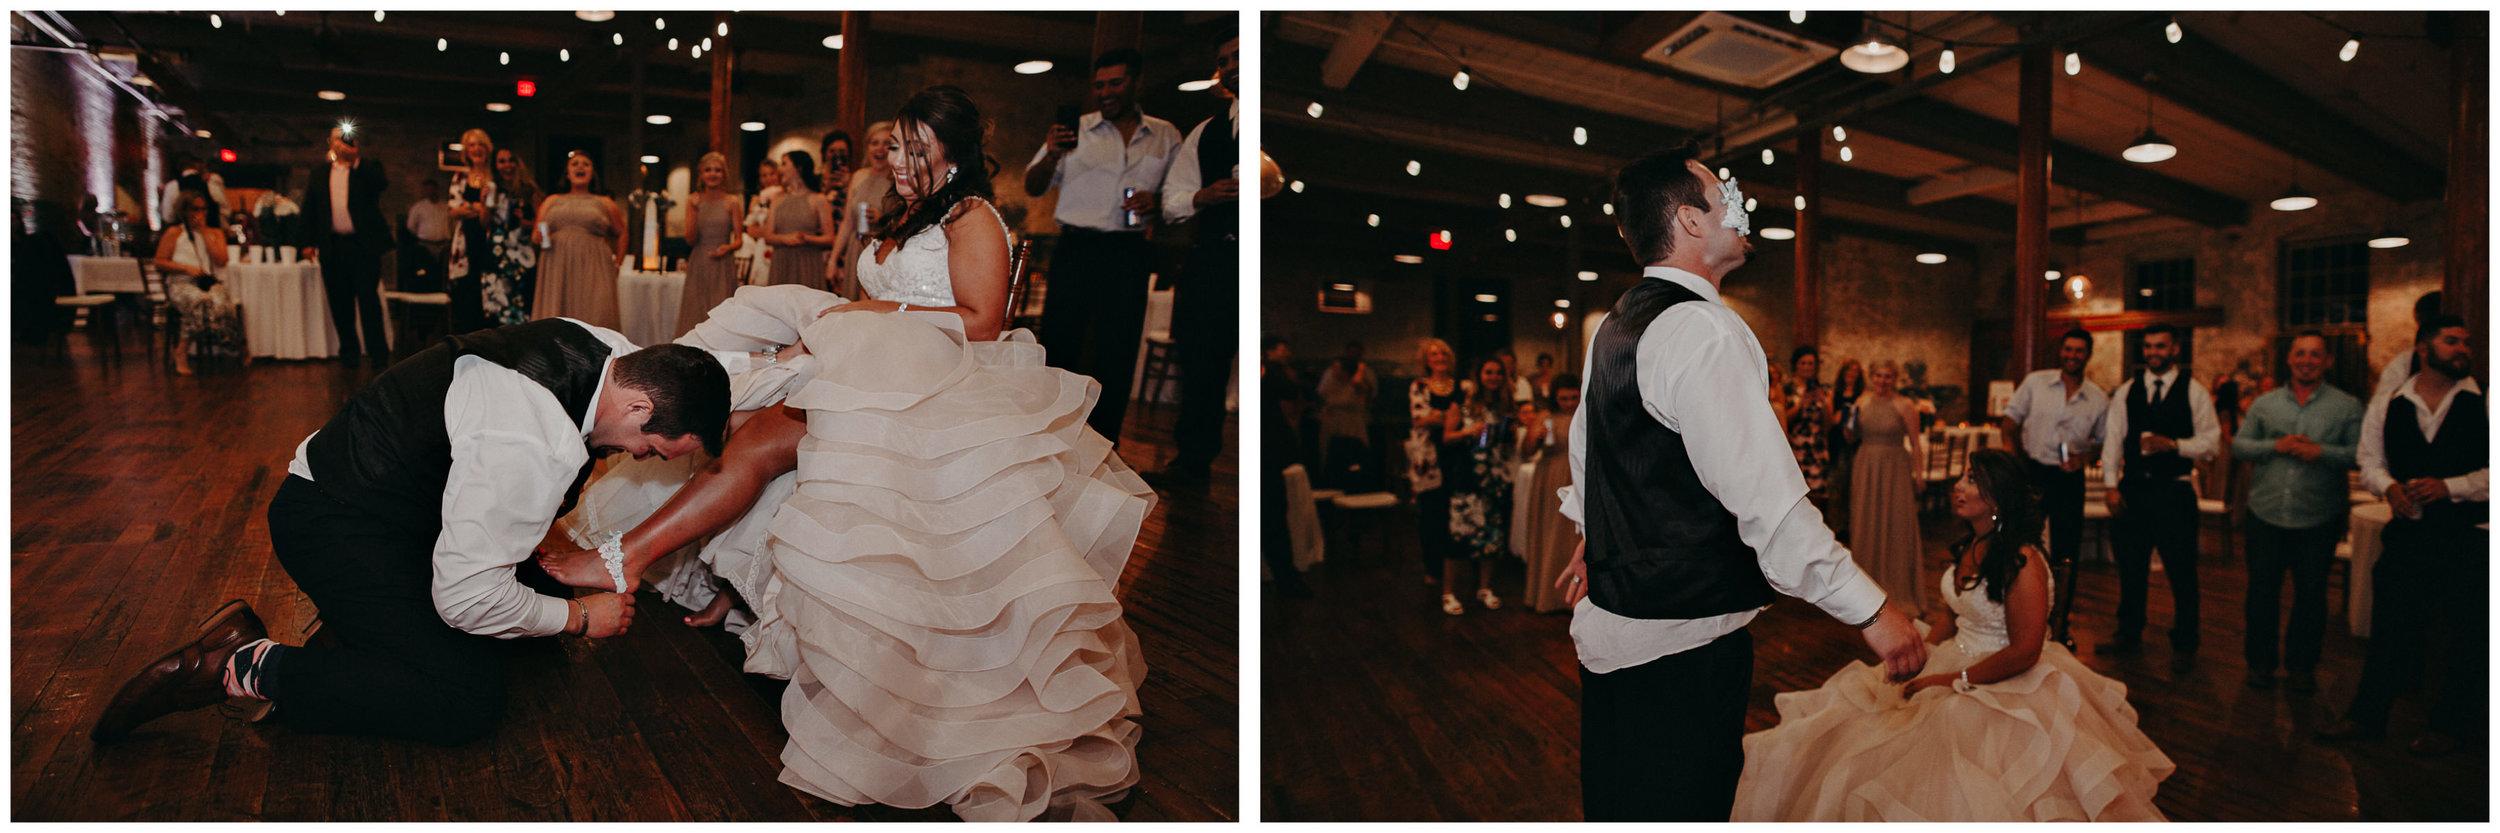 74 - Atlanta Wedding Photographer - The engine room - Ga - Wedding trends - Aline Marin Photography.jpg